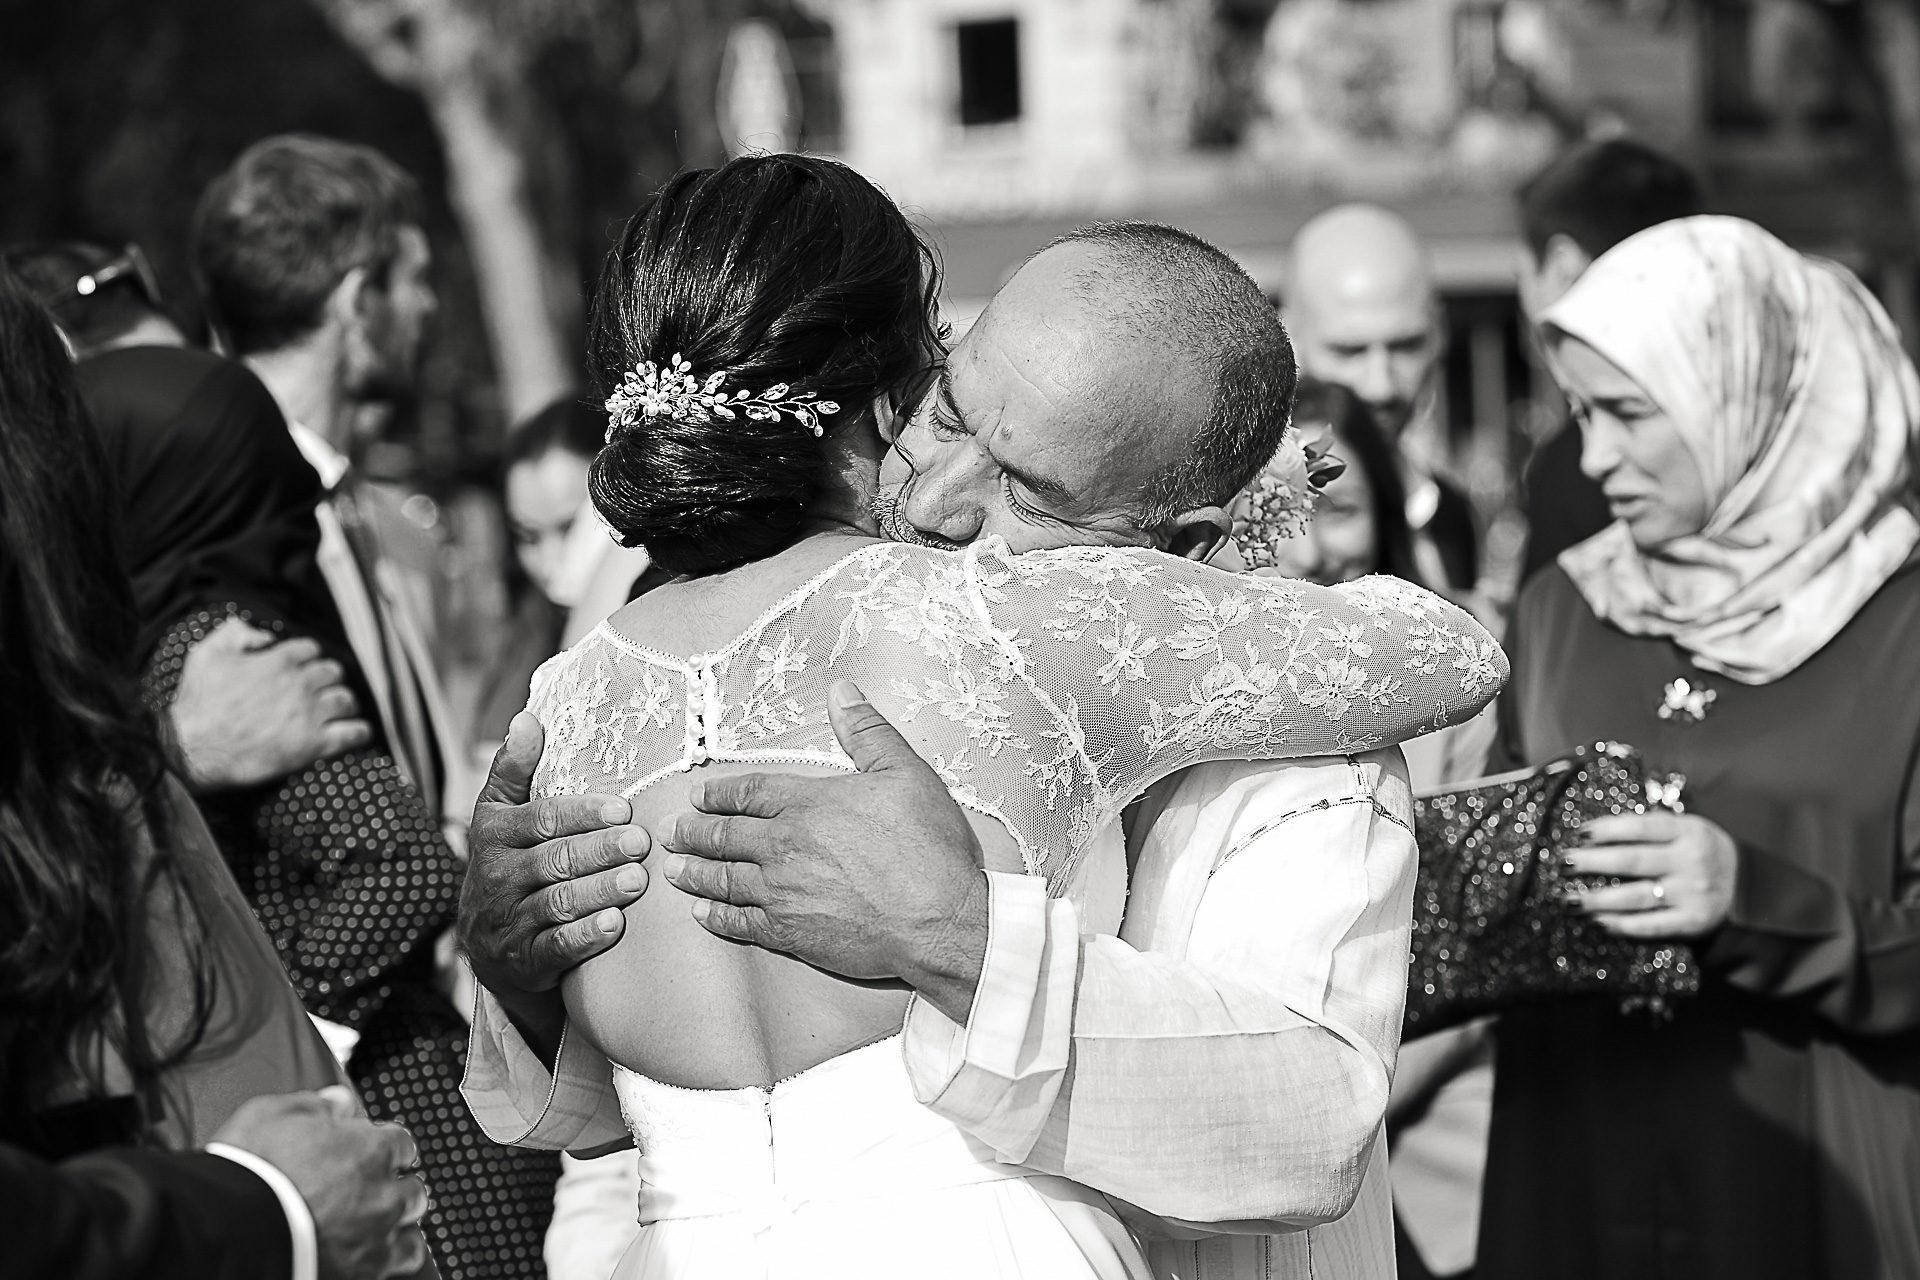 photographe-mariage-reportage-photos-mariee-et-son-pere